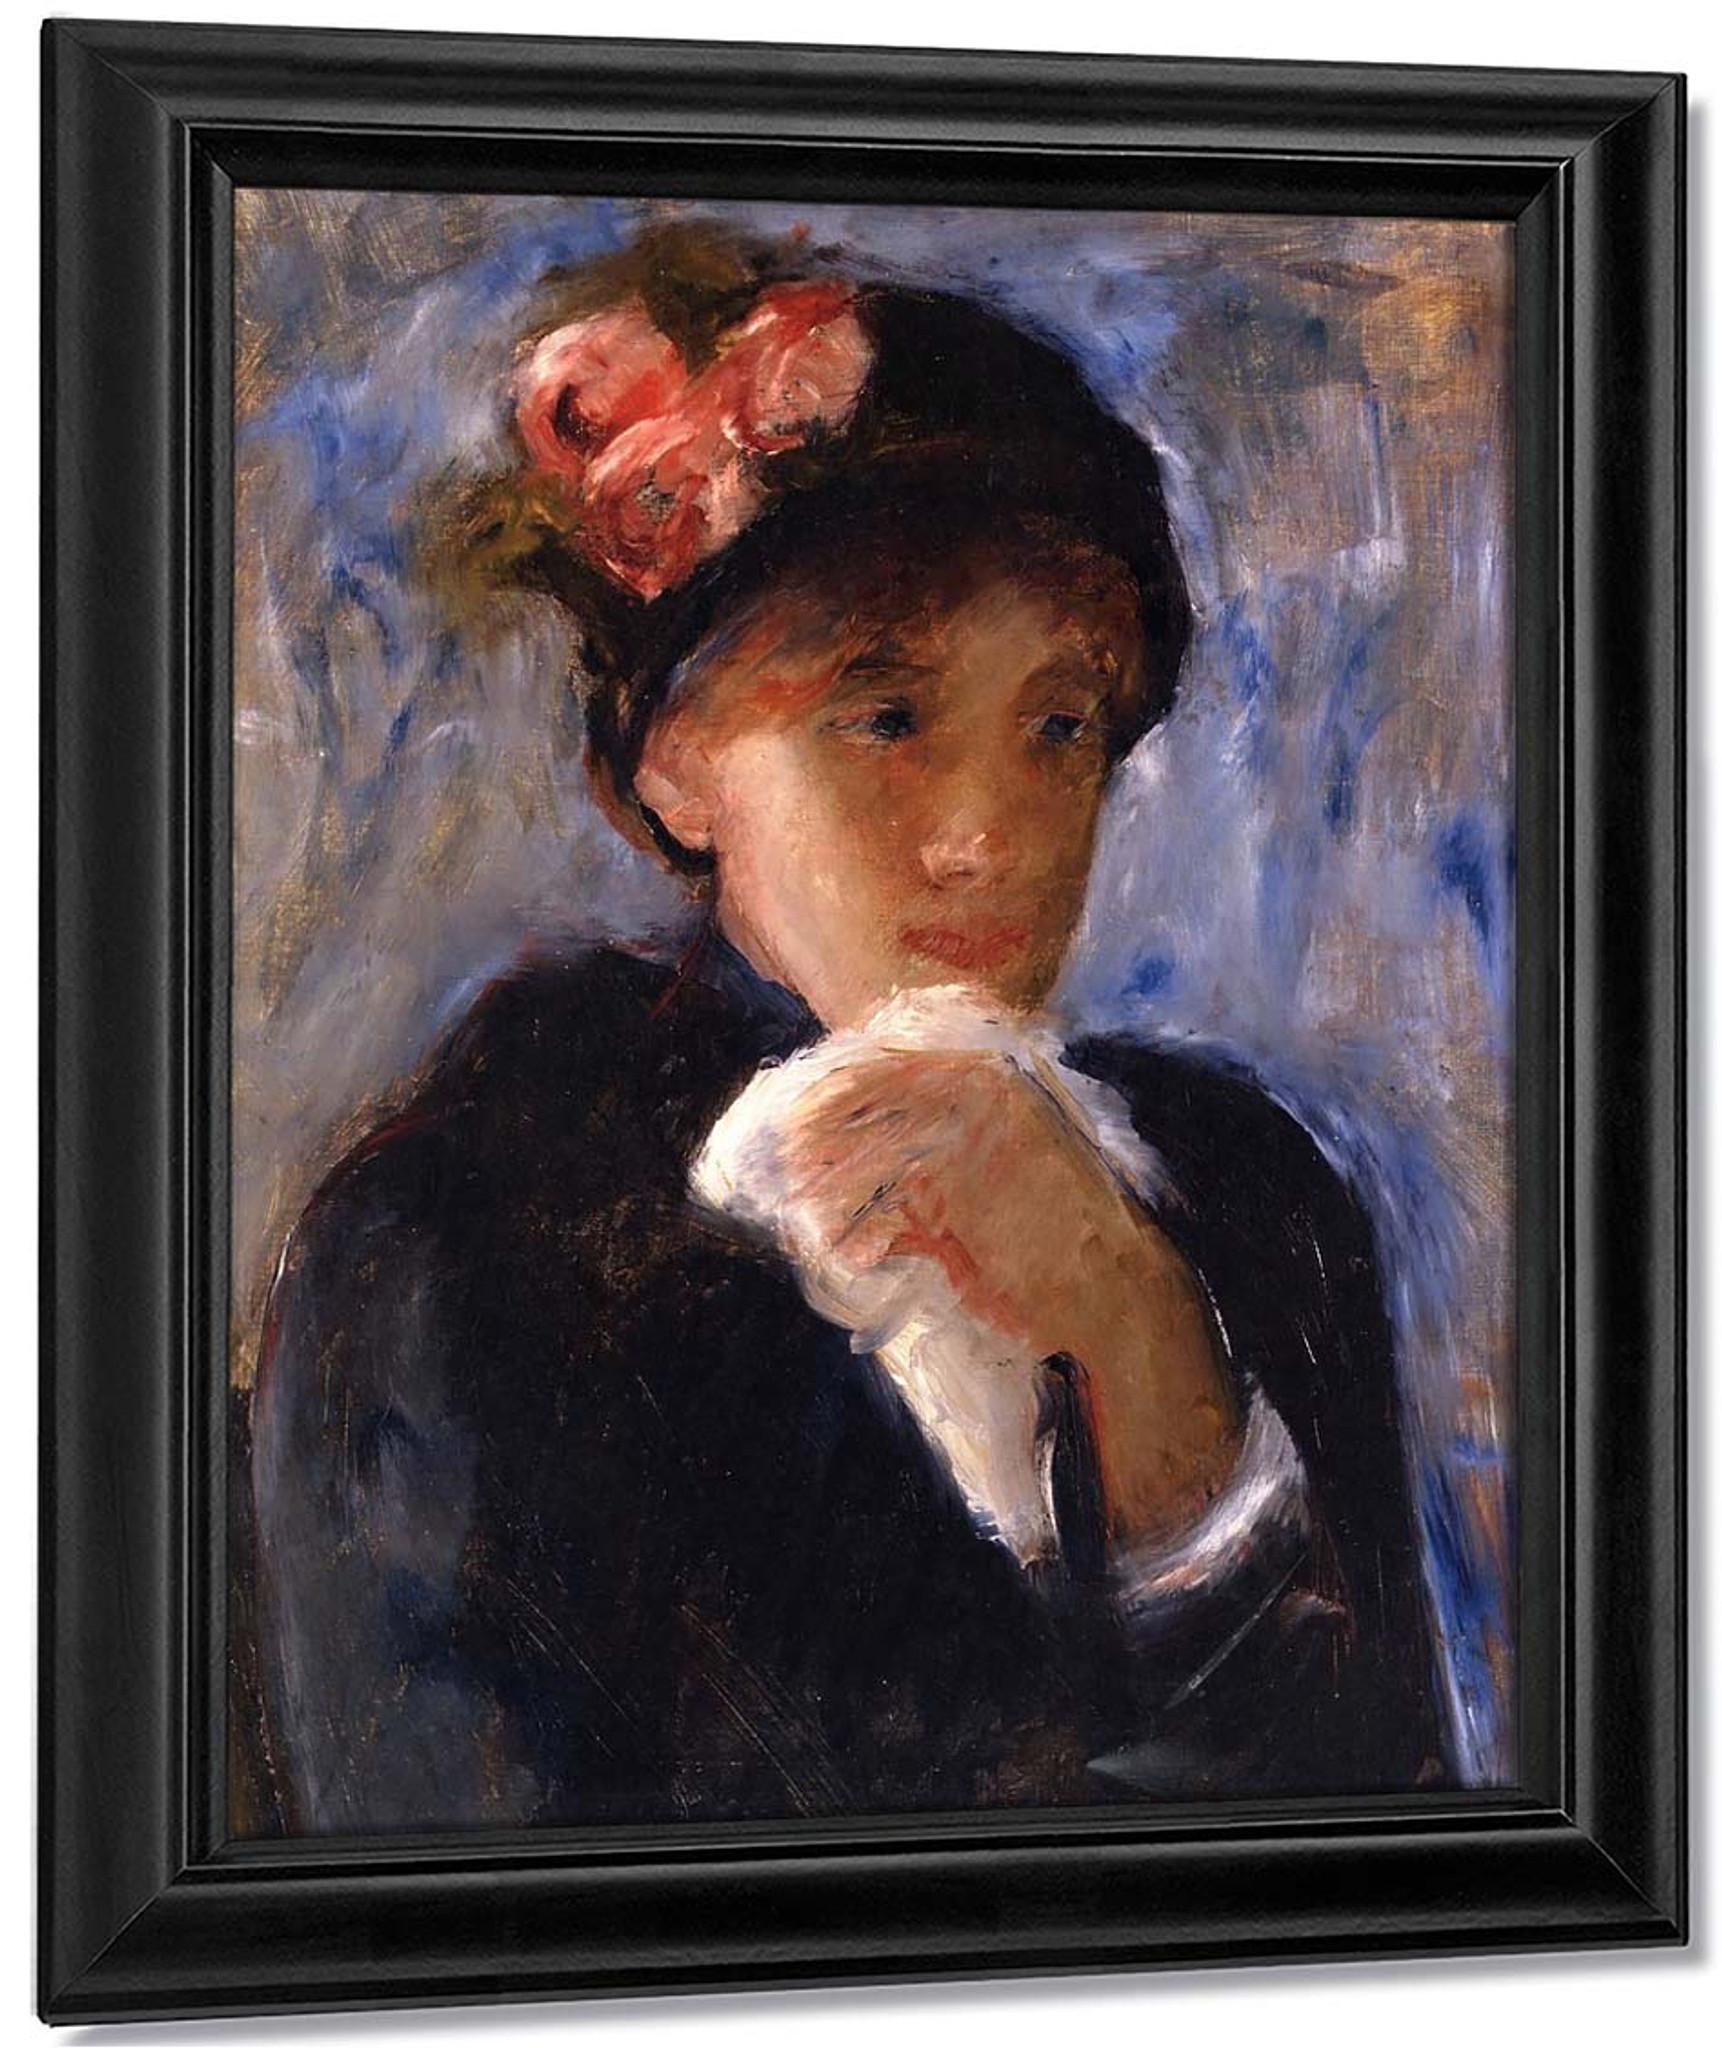 Woman With Handkerchief By Mary Cassatt Reproduction